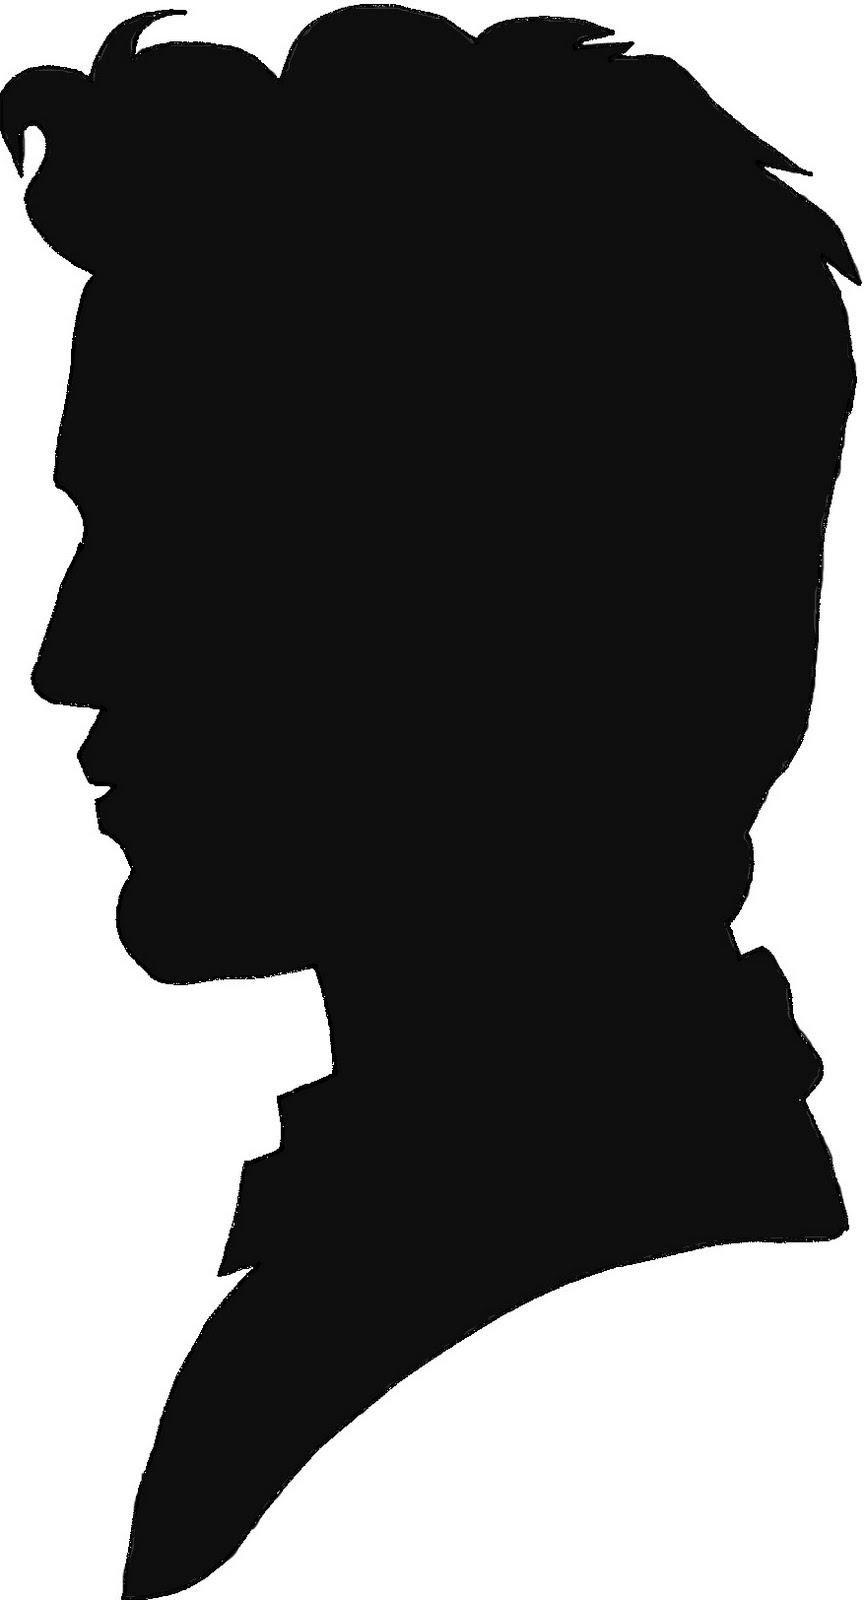 864x1600 Best Head Profile Silhouette Clipart Image